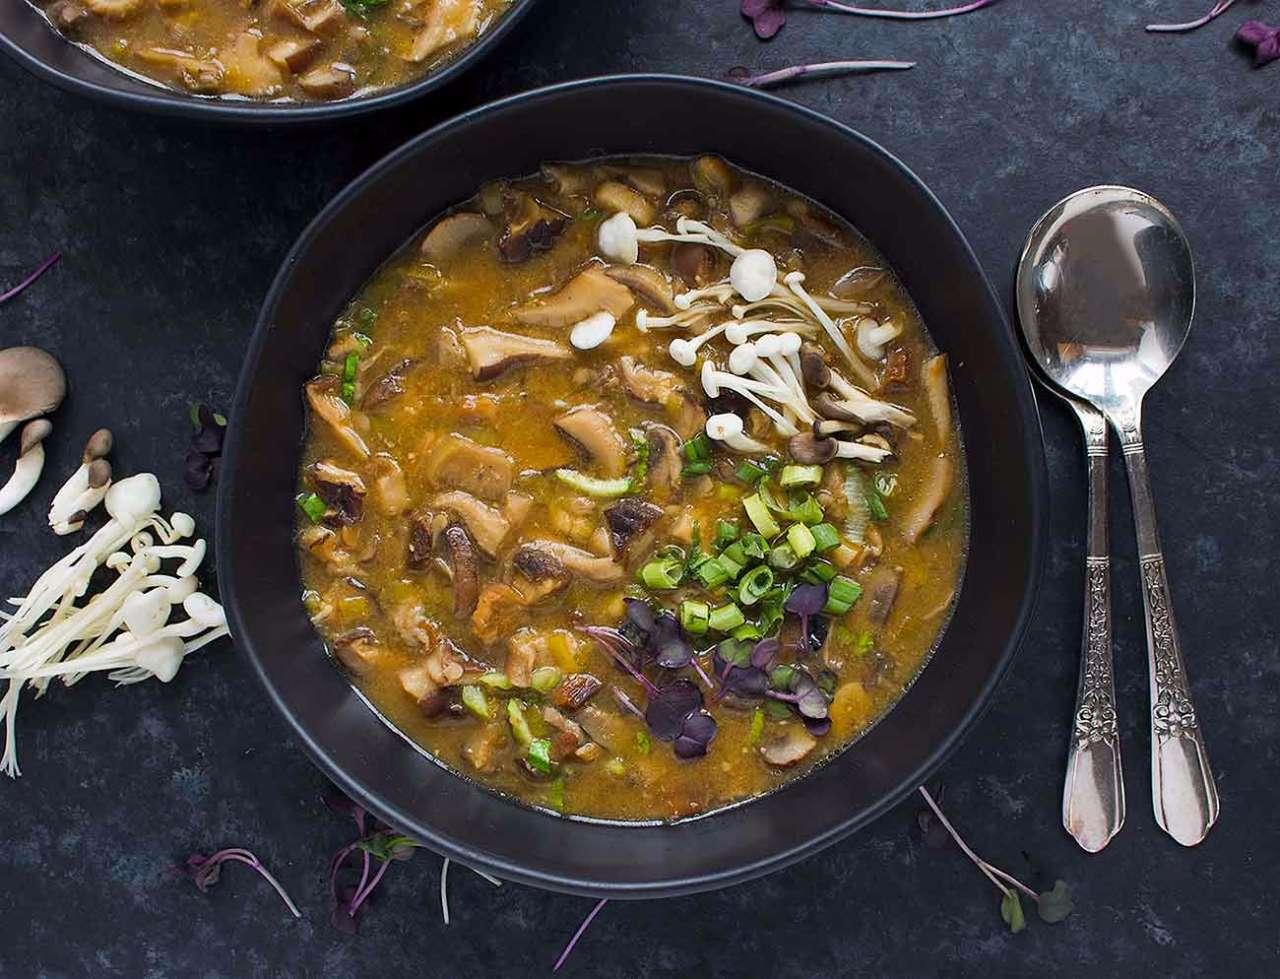 detox-wild-mushroom-miso-soup-1361-1217